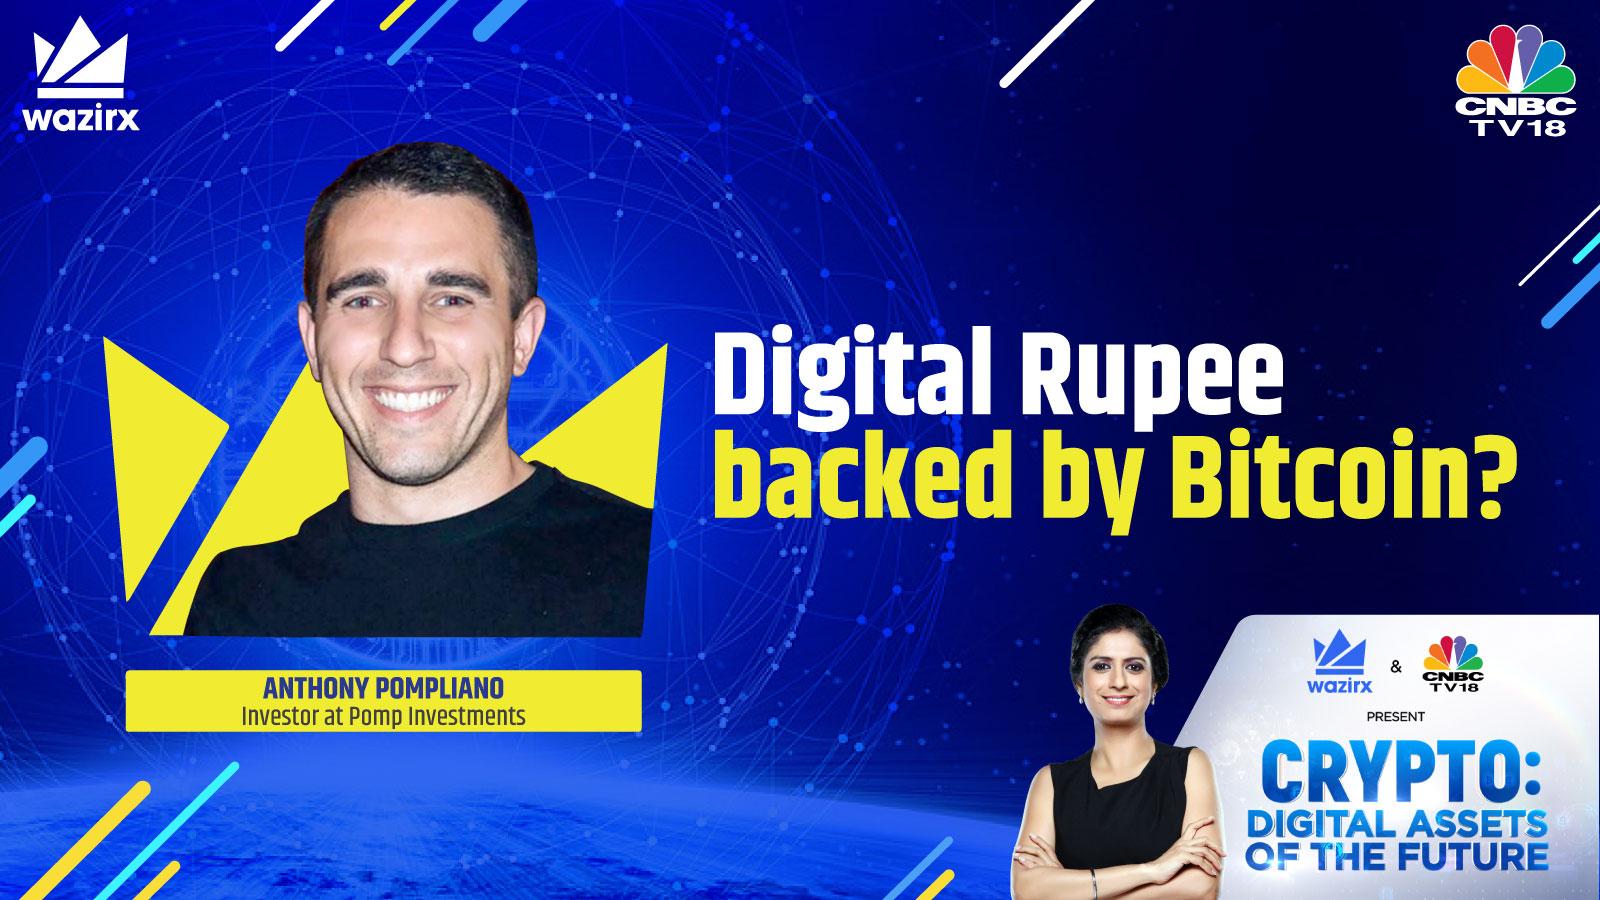 Anthony Pompliano on Digital Rupee backed by Bitcoin